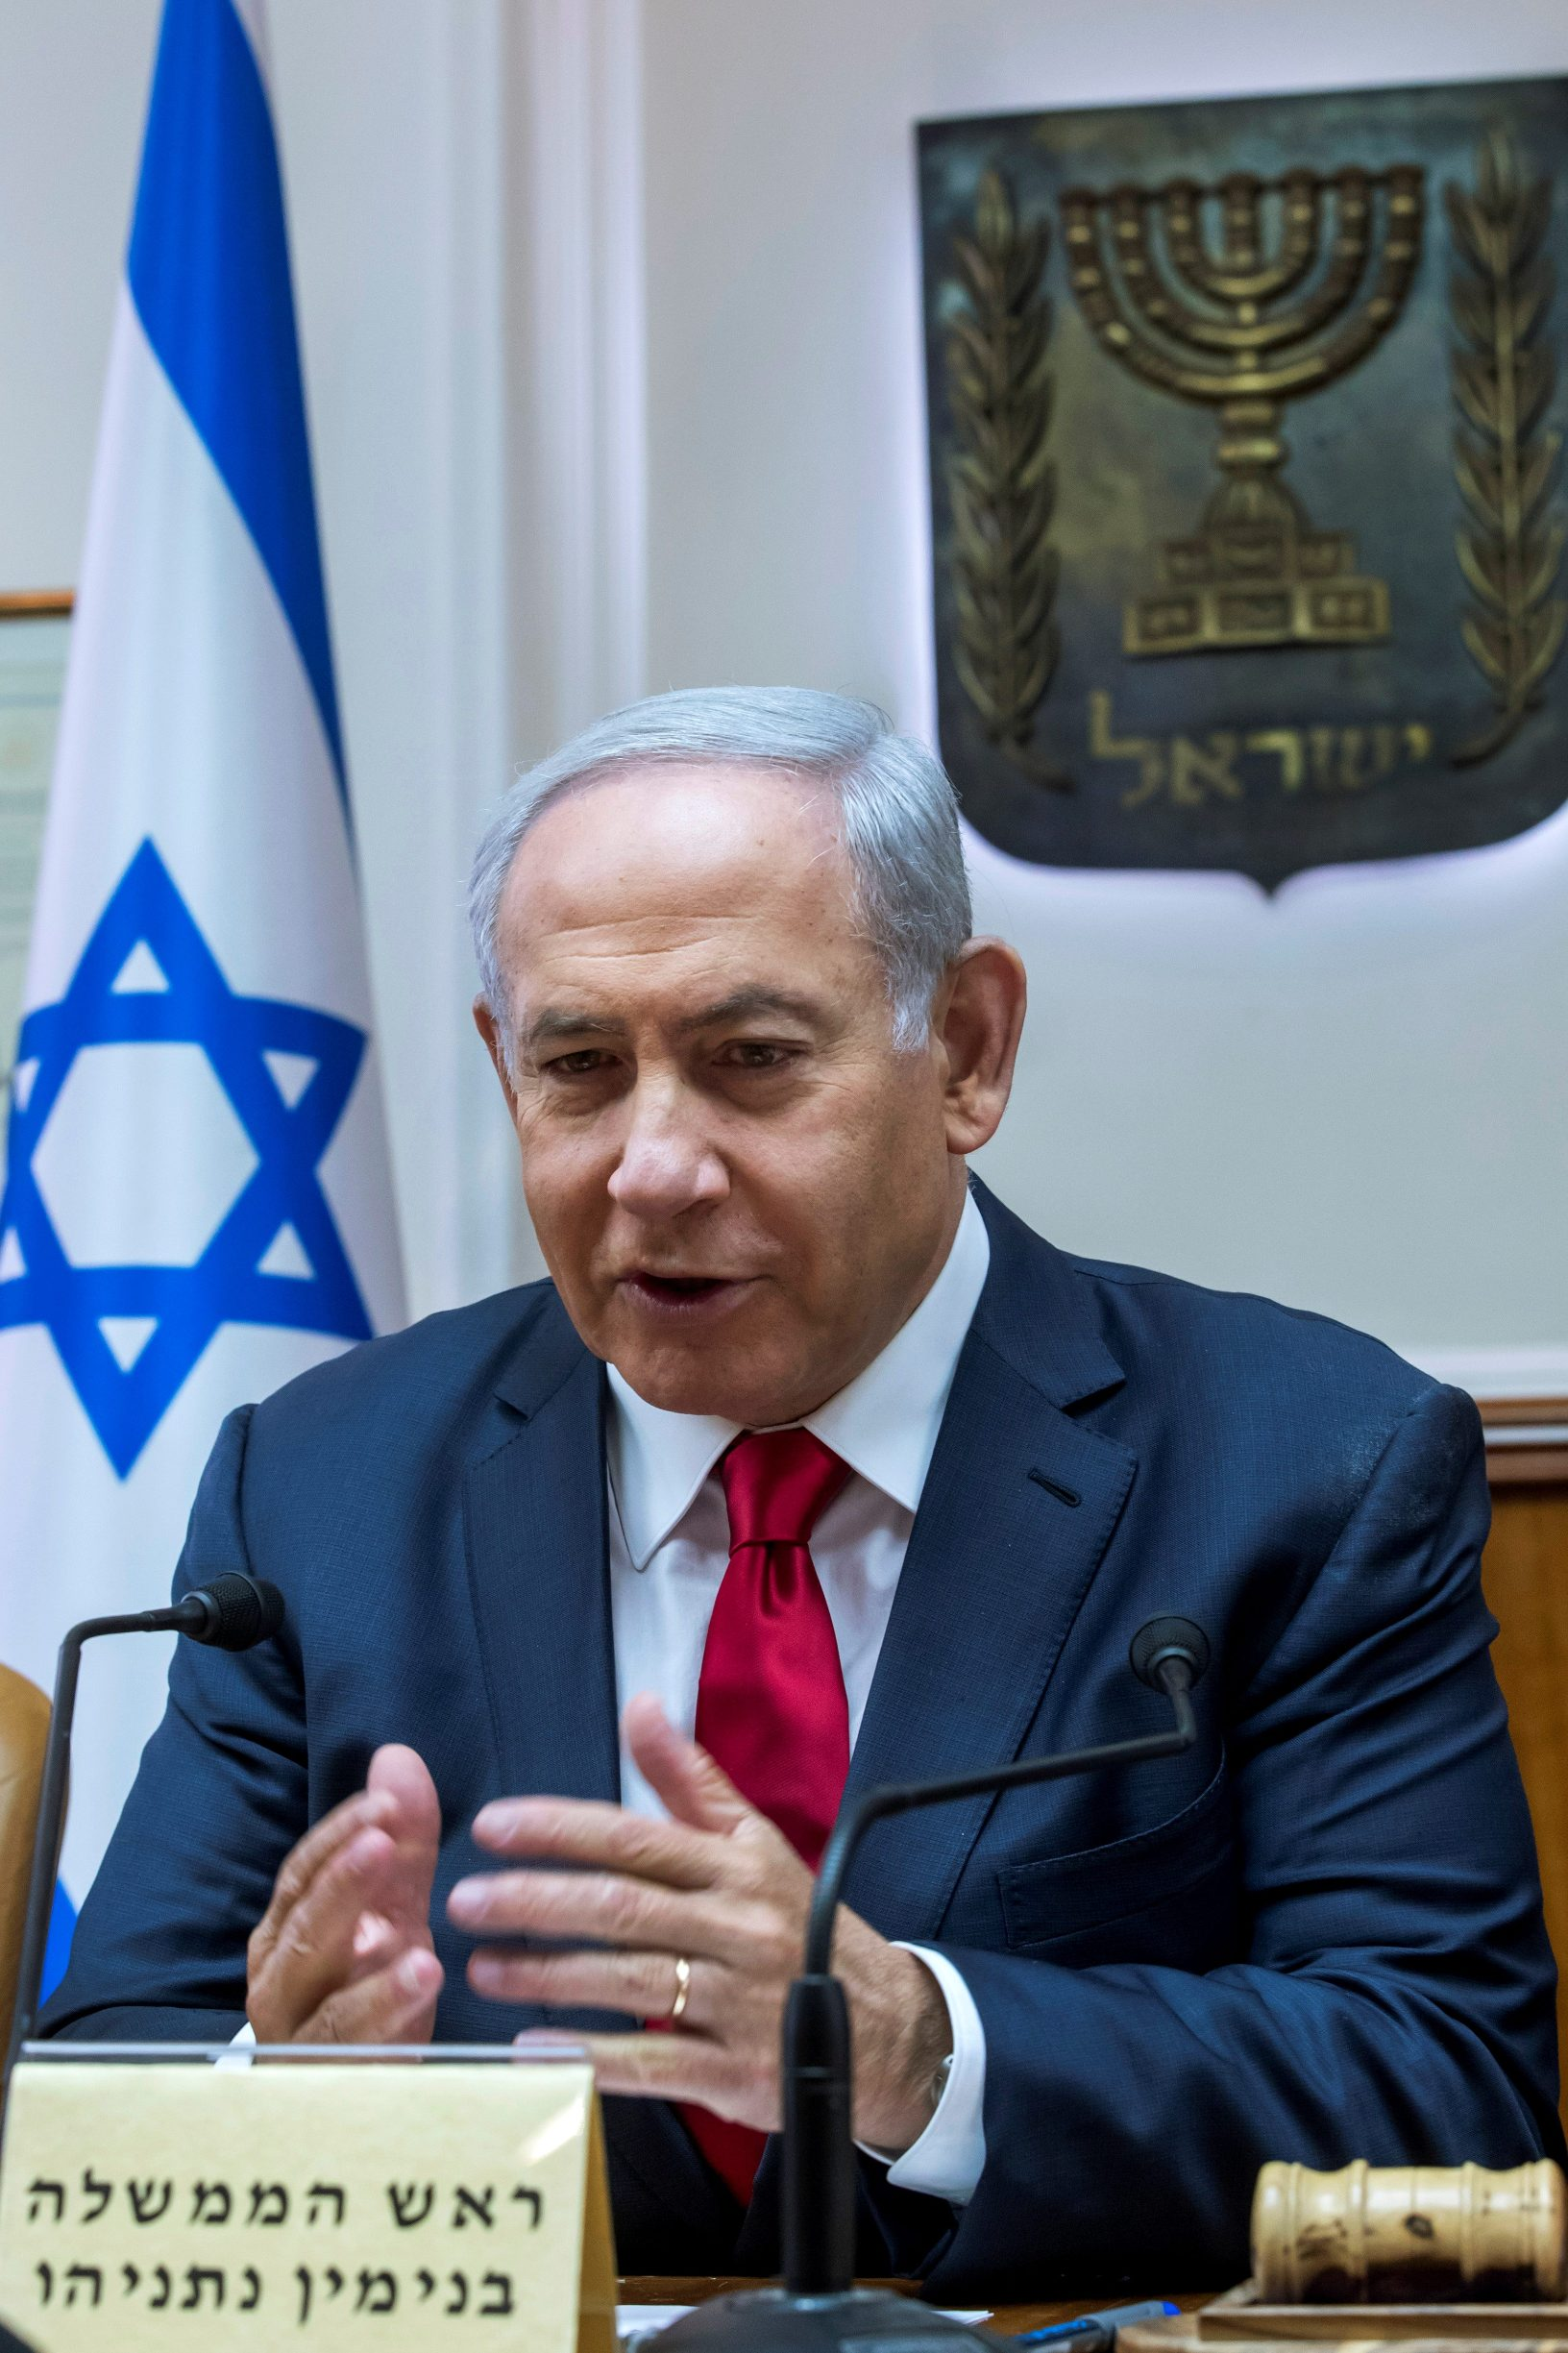 2019-05-26T111644Z_693939317_RC1C58EA8690_RTRMADP_3_ISRAEL-POLITICS